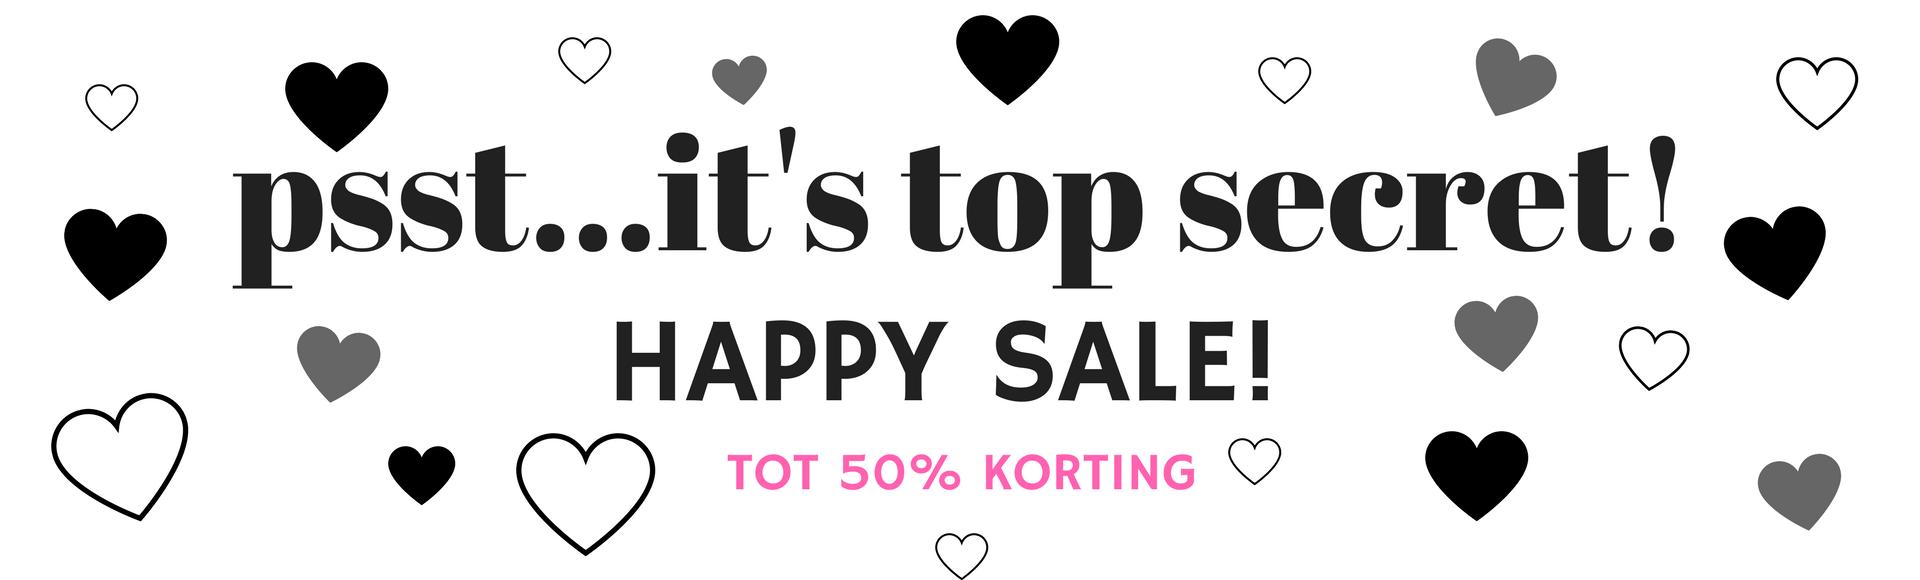 Topsz | Hippe Fashion en lifestyle musthaves bij Topsz!